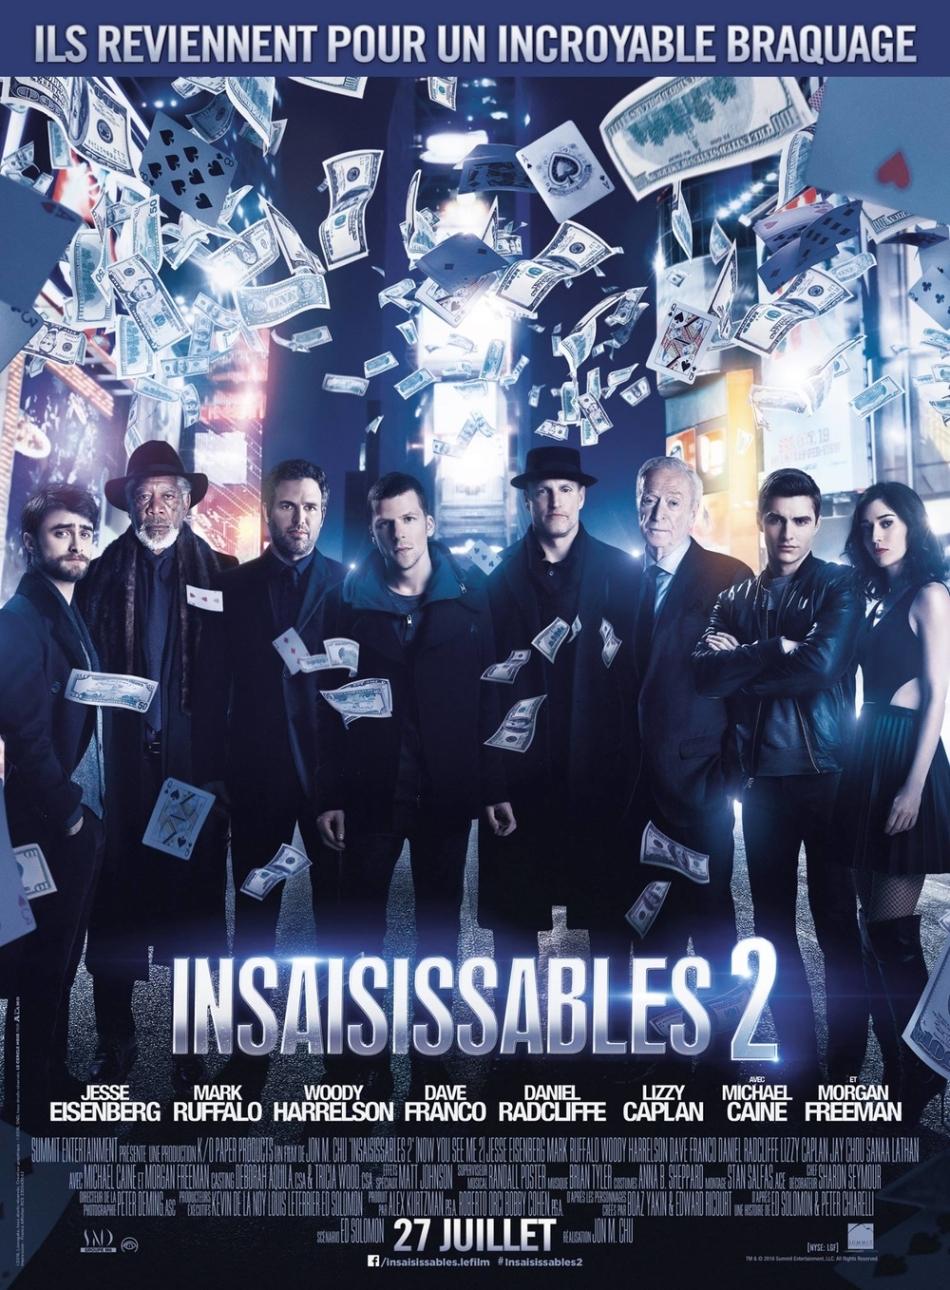 Insaisissables_2